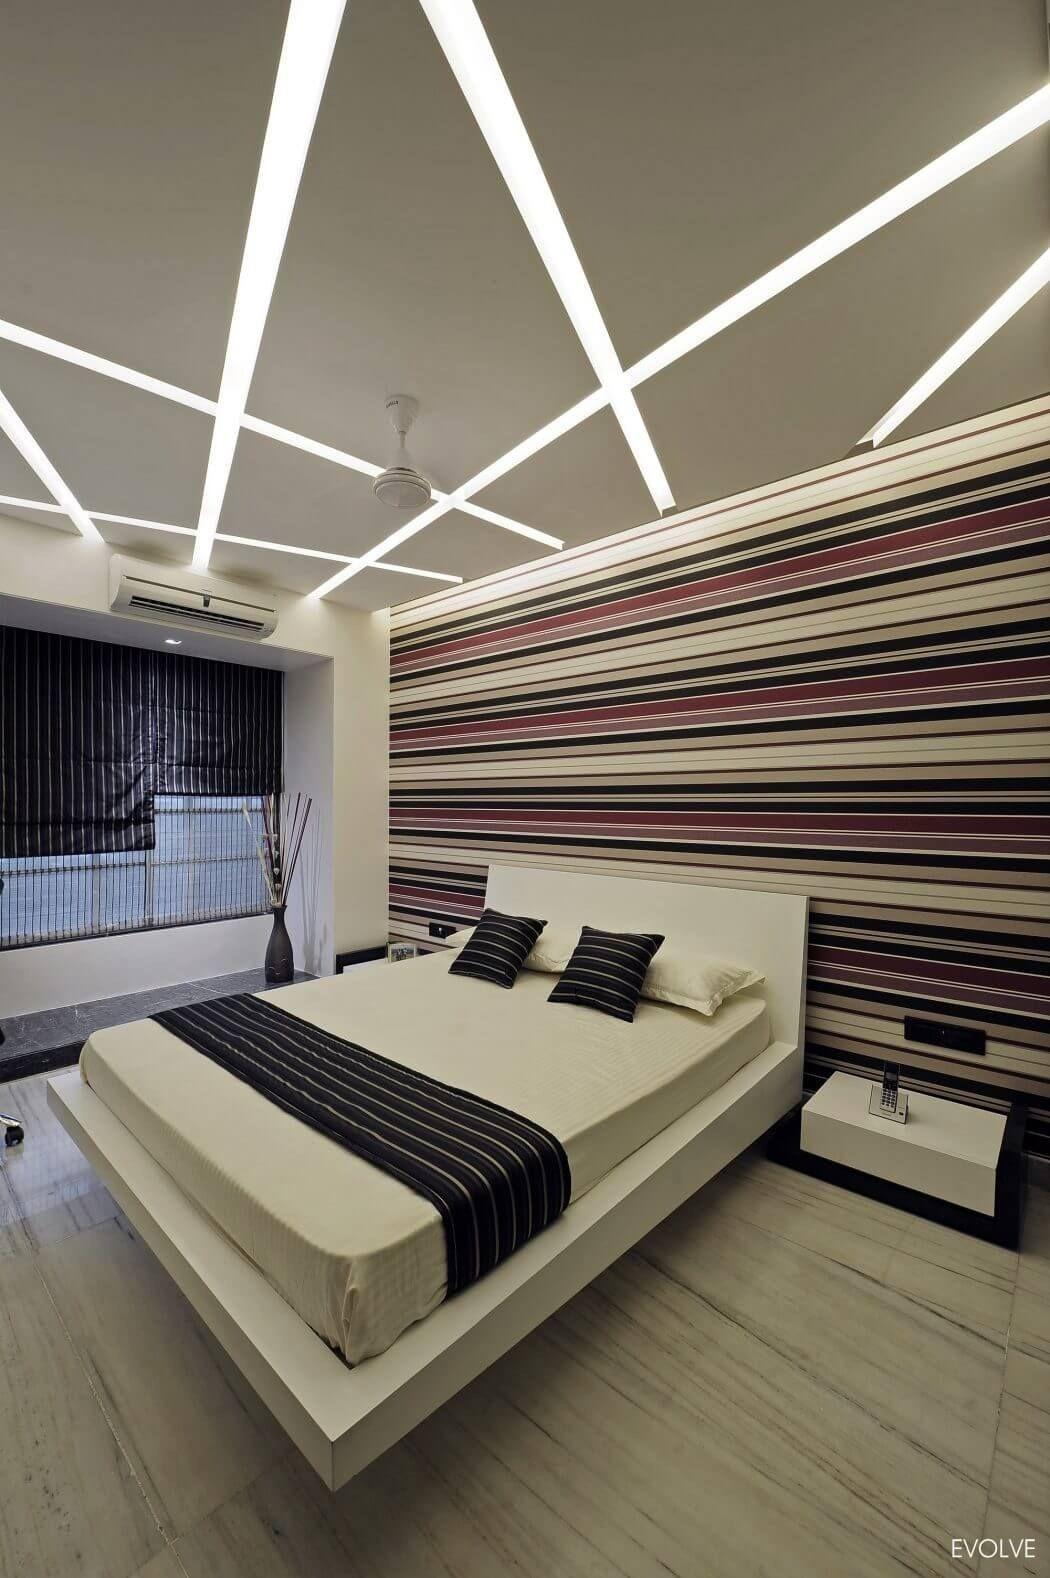 Pin by pilu sitapara on bed pinterest ceilings false - Plafones modernos ...